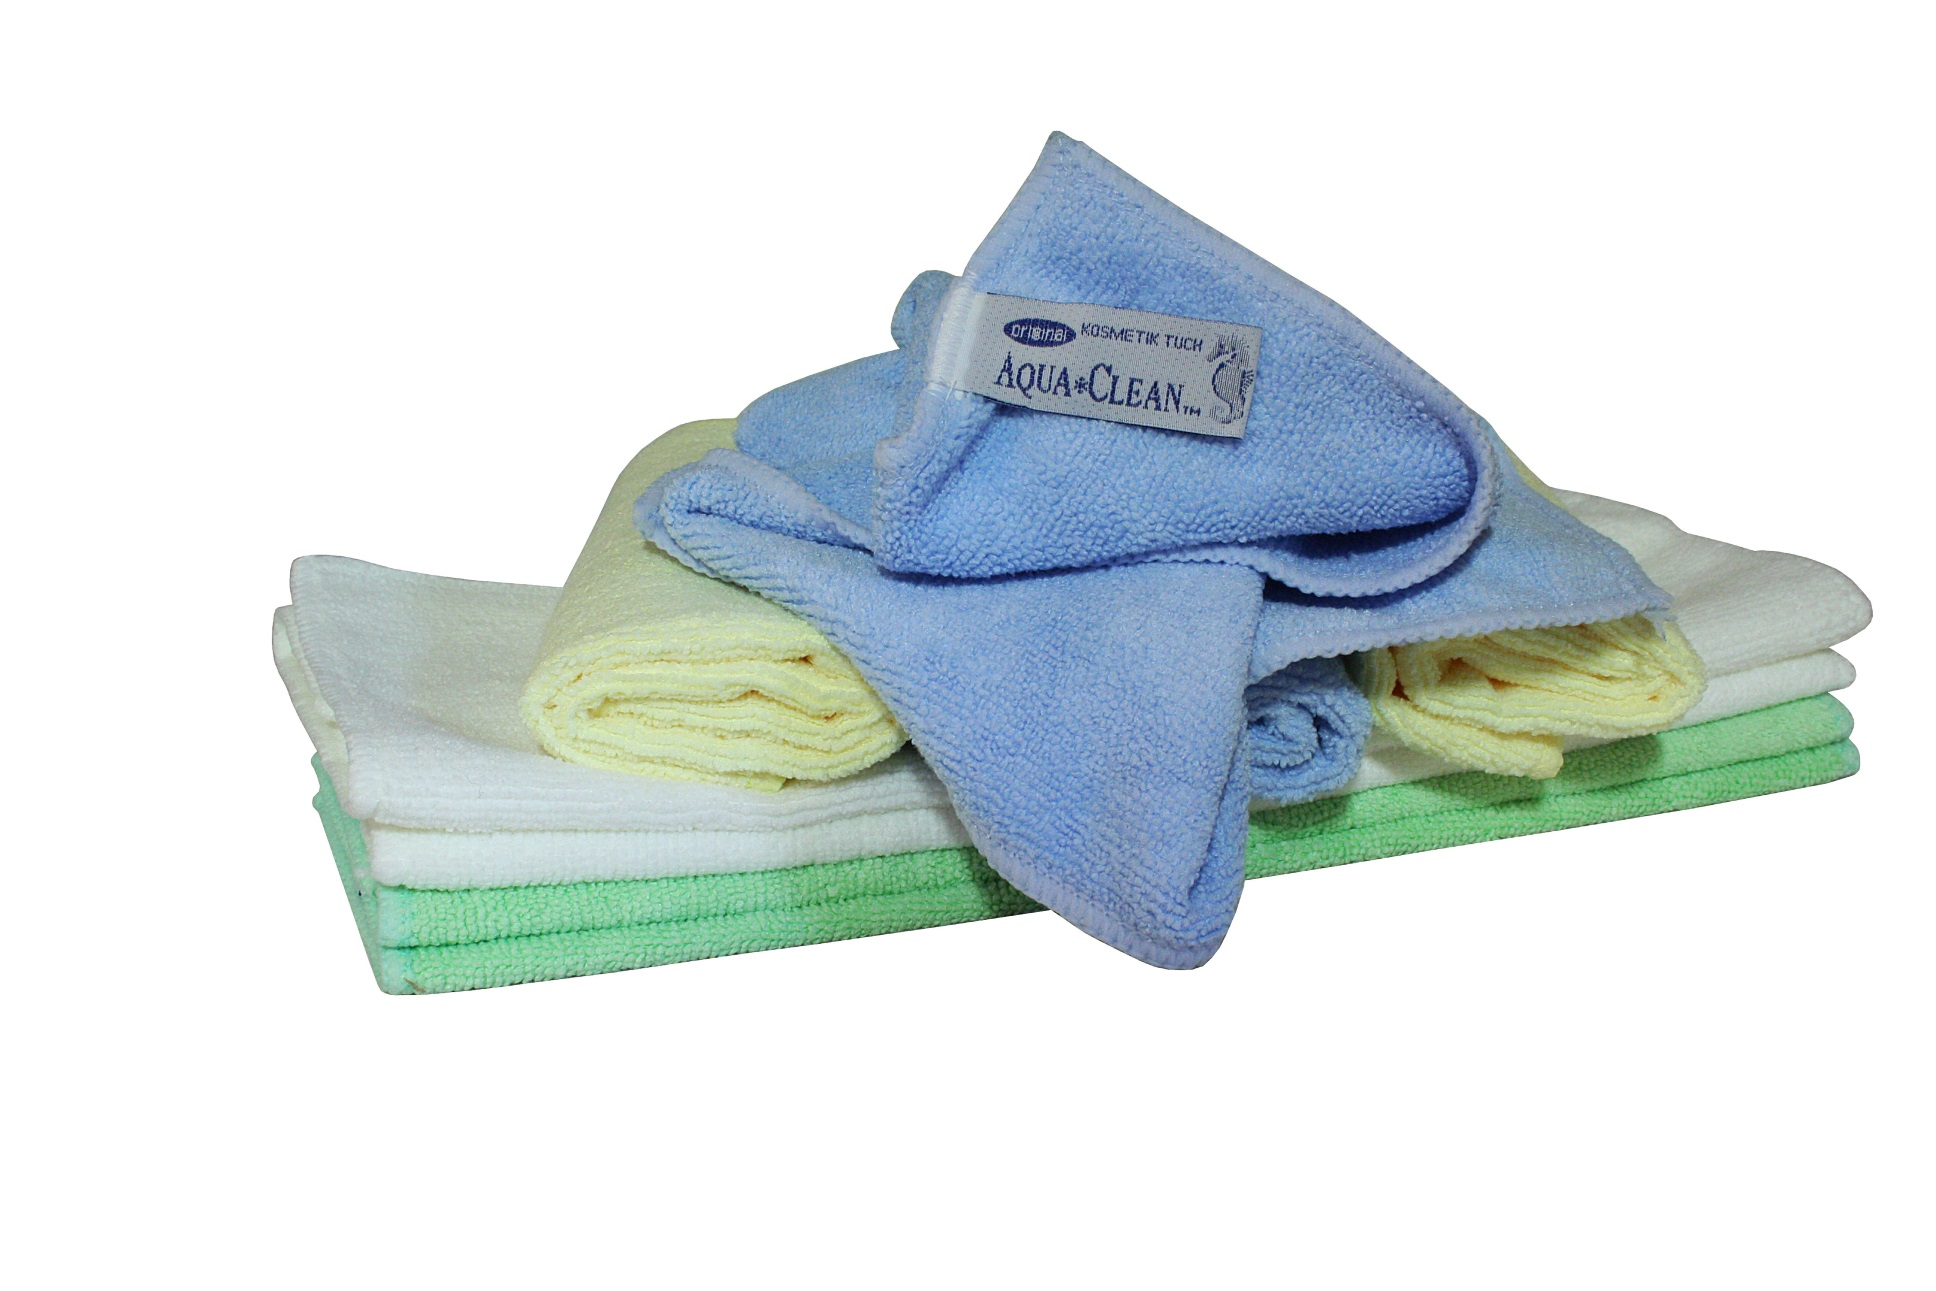 aqua clean microfaser kosmetikt cher 8er set aqua clean. Black Bedroom Furniture Sets. Home Design Ideas